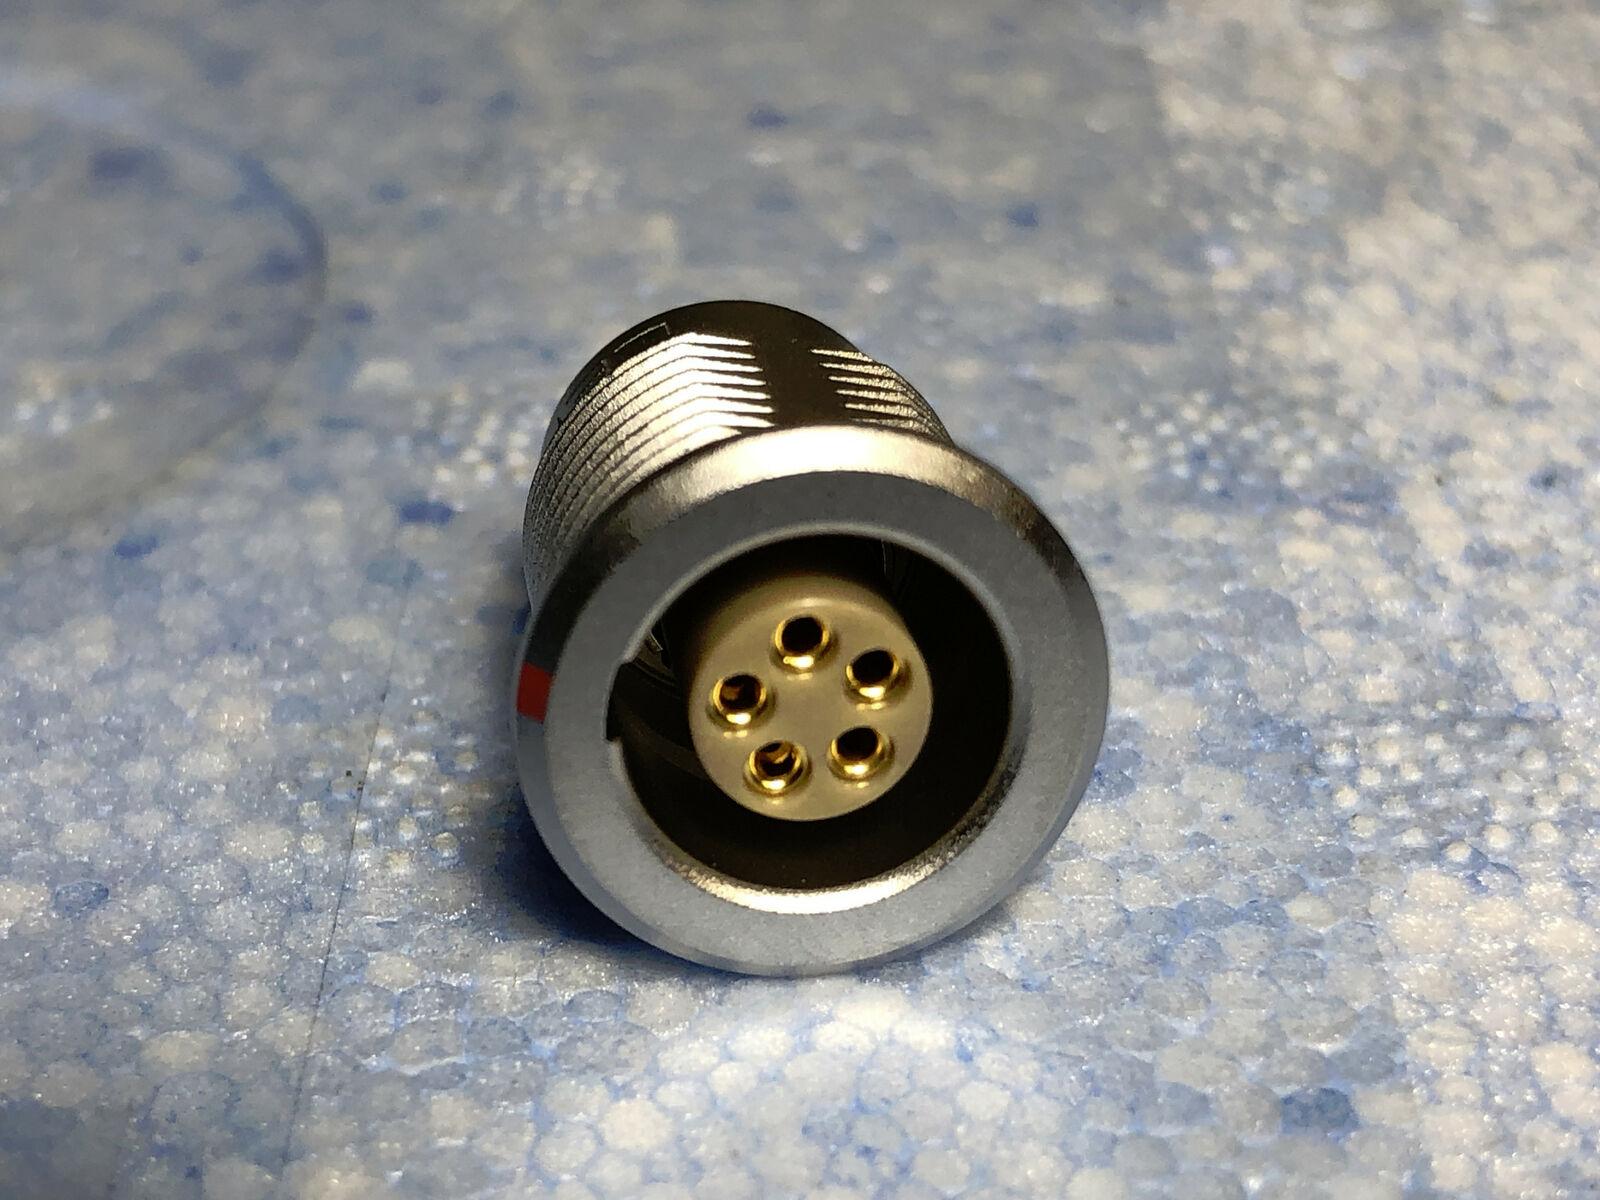 Lot of 5 Lemo 7-Pin to Microdot Coaxial Adapter FGG.1B